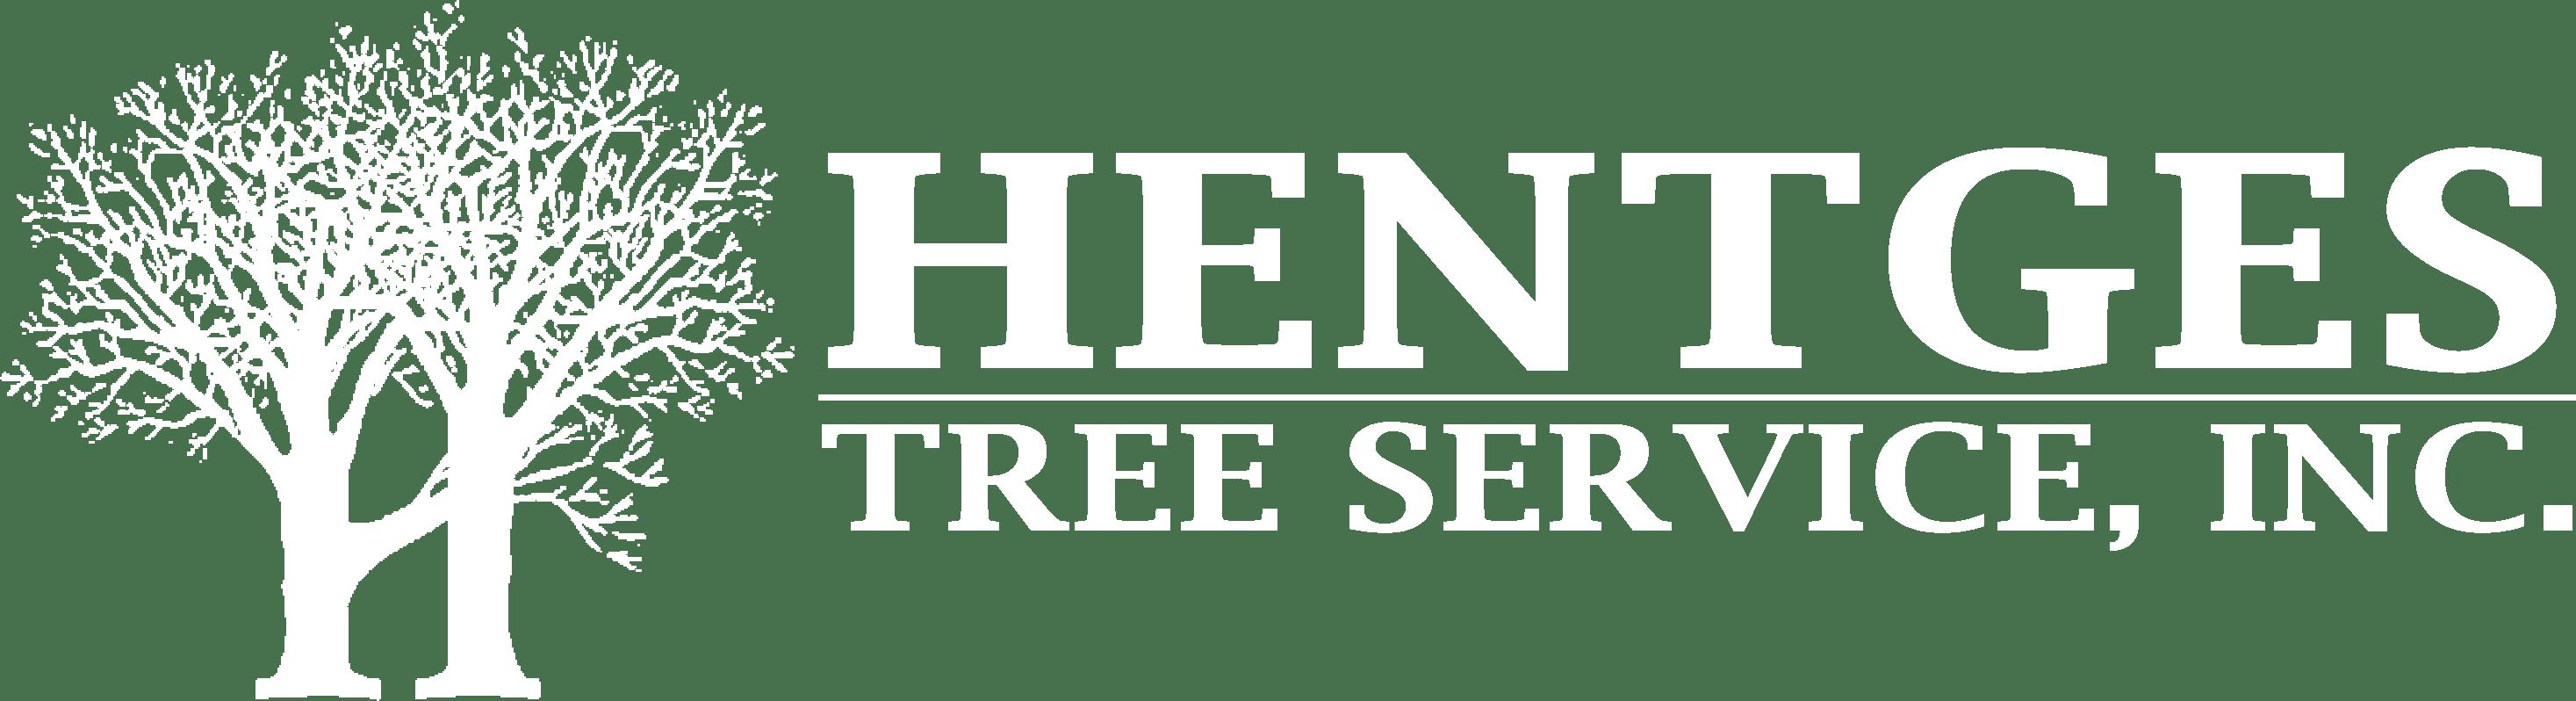 Hentges Tree Service in Jefferson City, Missouri